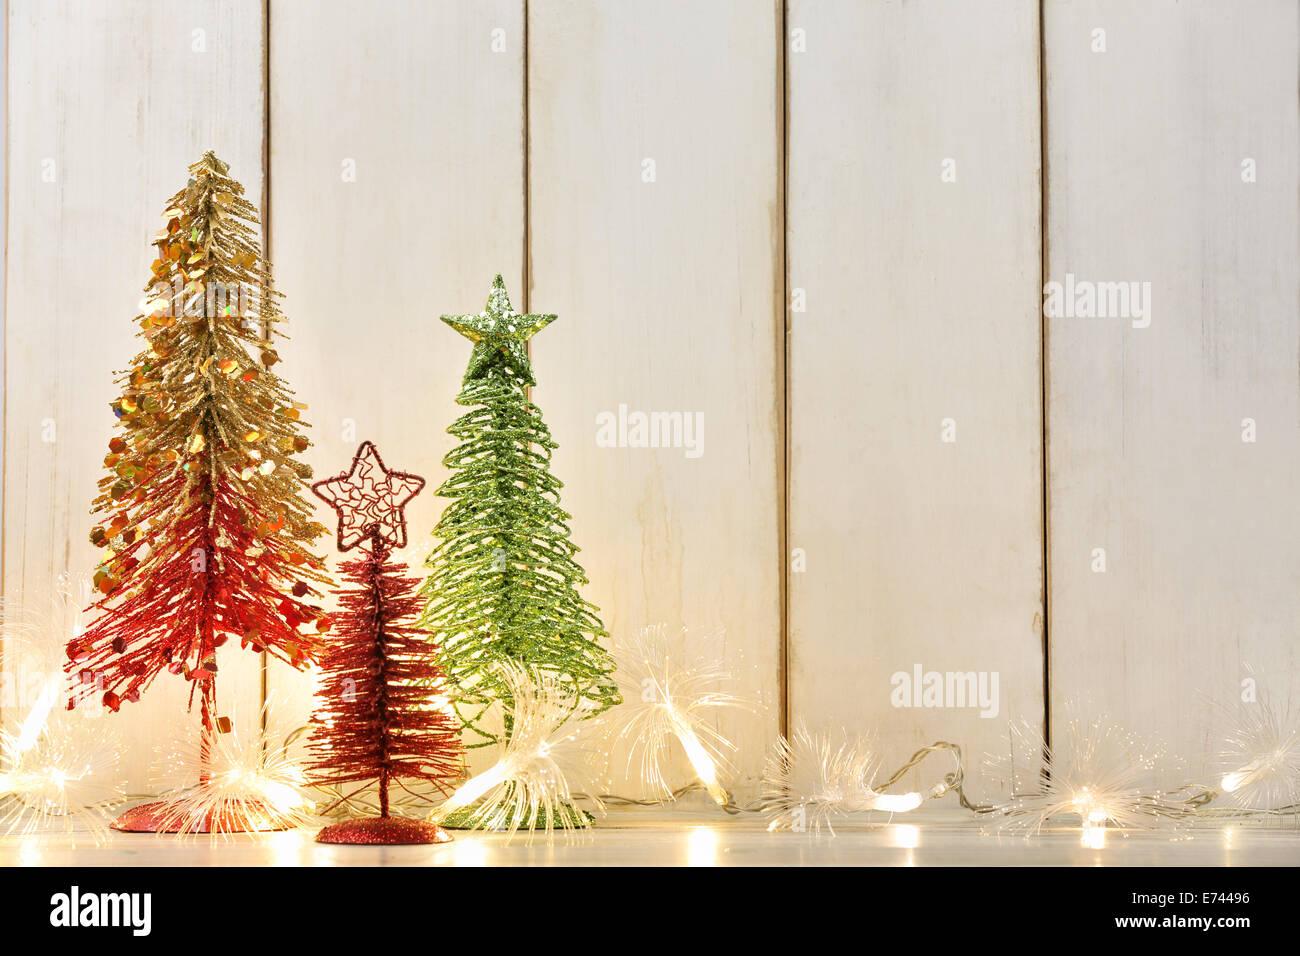 Miniature Live Christmas Tree